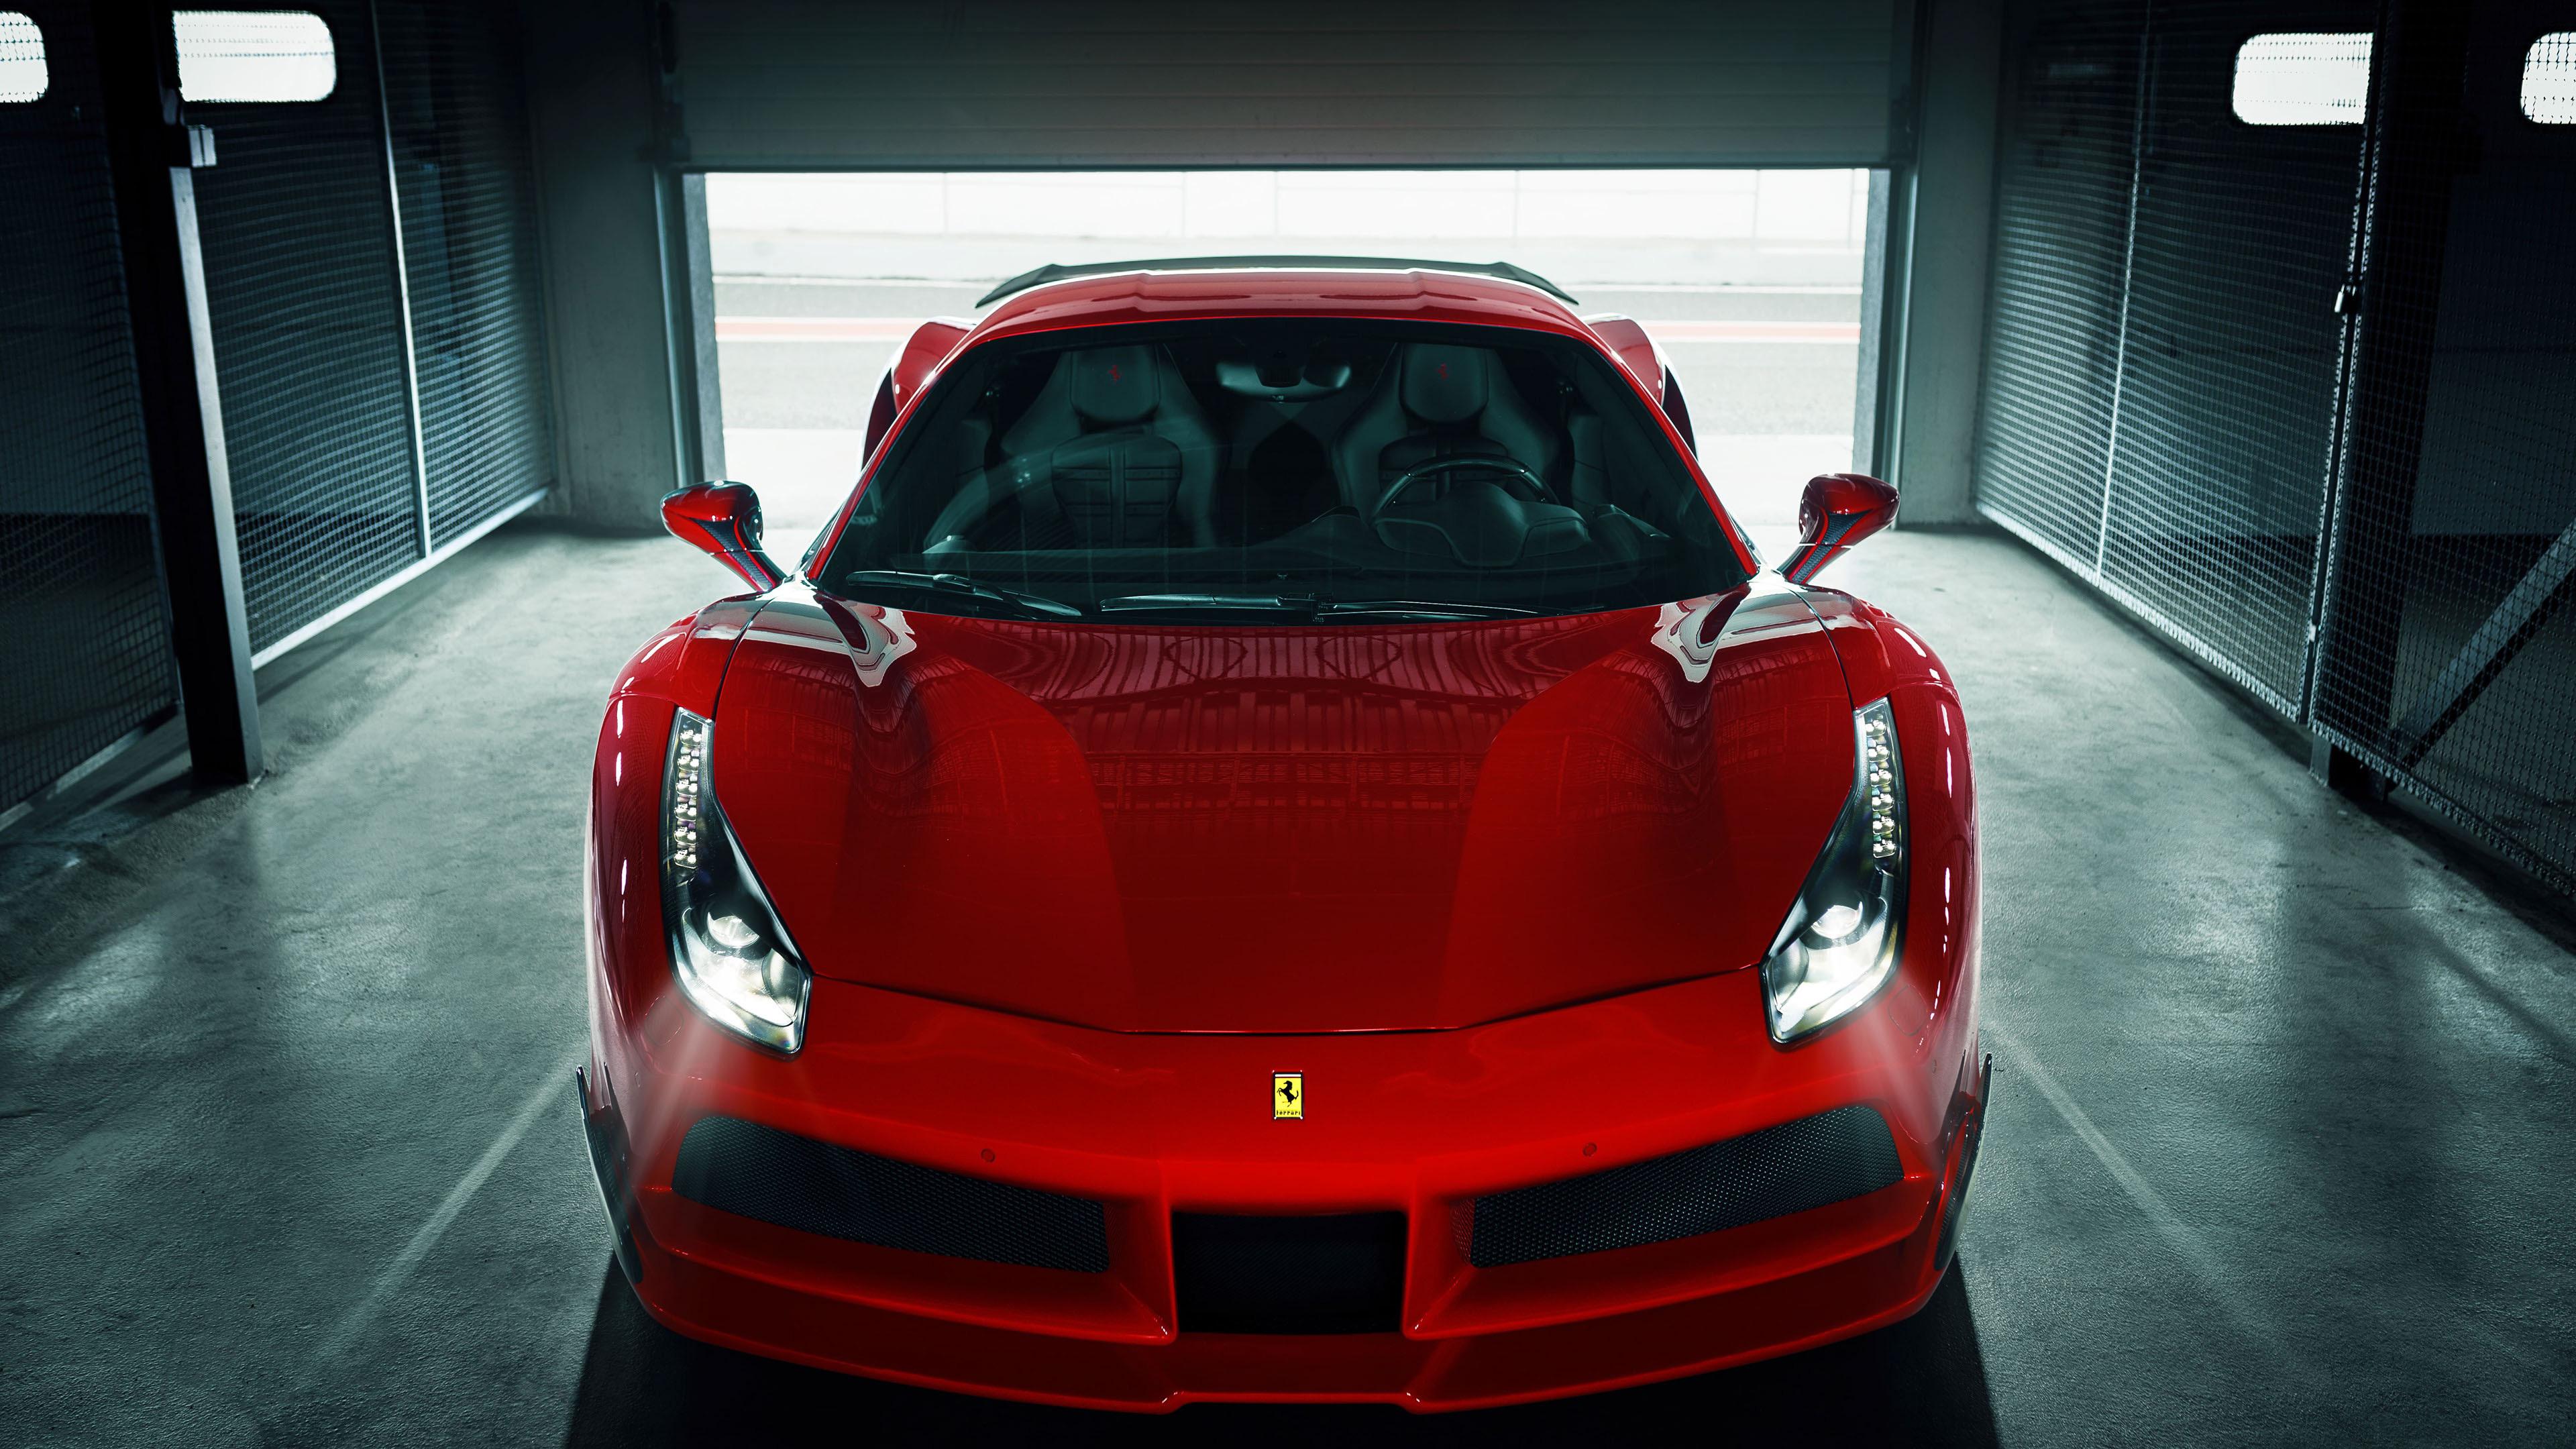 ferrari 488 gtb front 1539112171 - Ferrari 488 Gtb Front - hd-wallpapers, ferrari wallpapers, ferrari 488 wallpapers, cars wallpapers, behance wallpapers, artist wallpapers, 4k-wallpapers